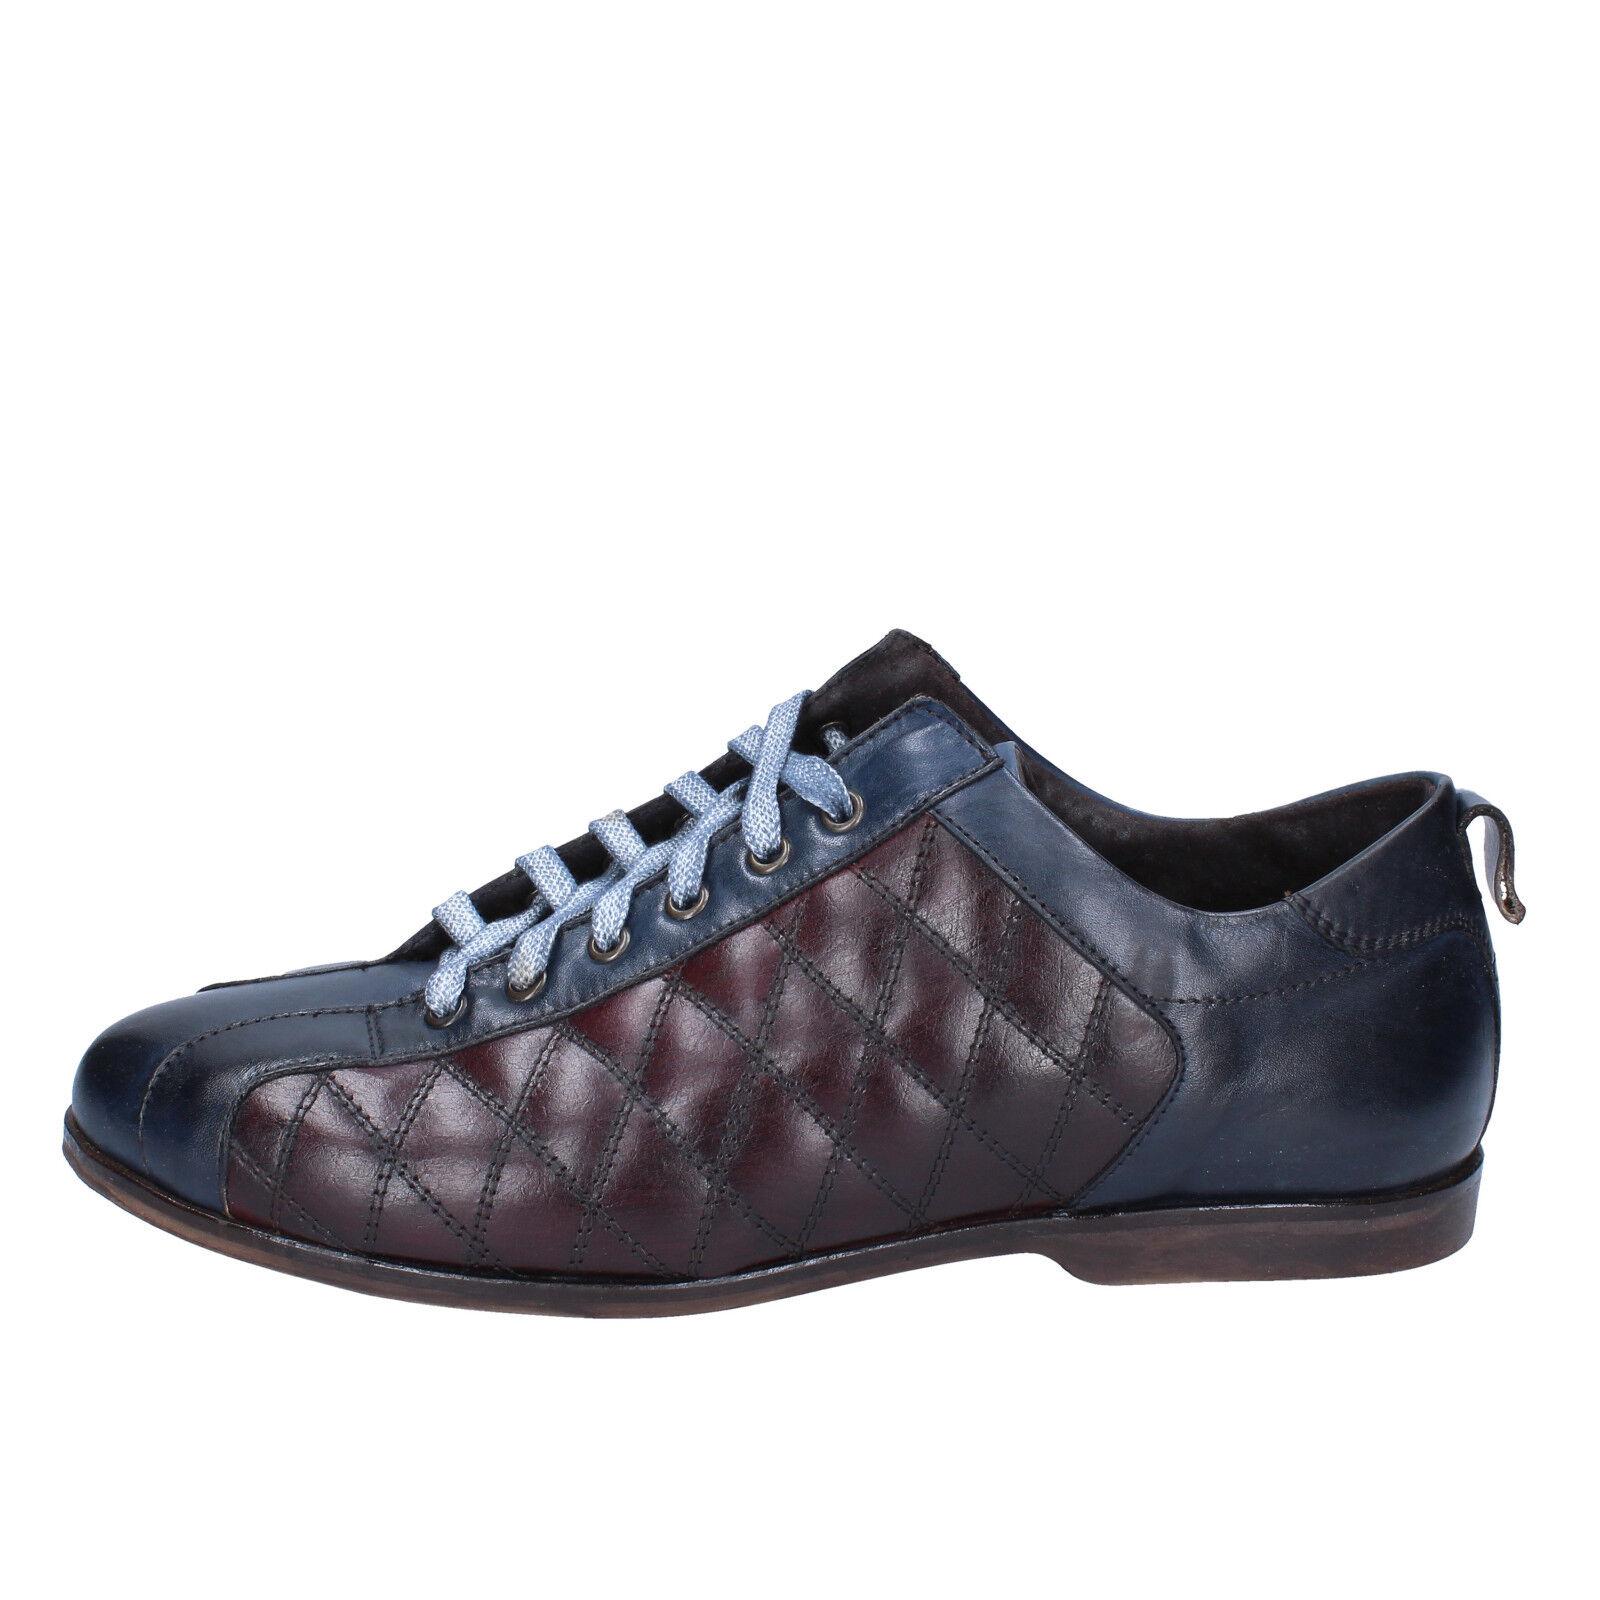 Mens shoes EVC 11 (EU 45) elegant burgundy bluee leather BX611-45